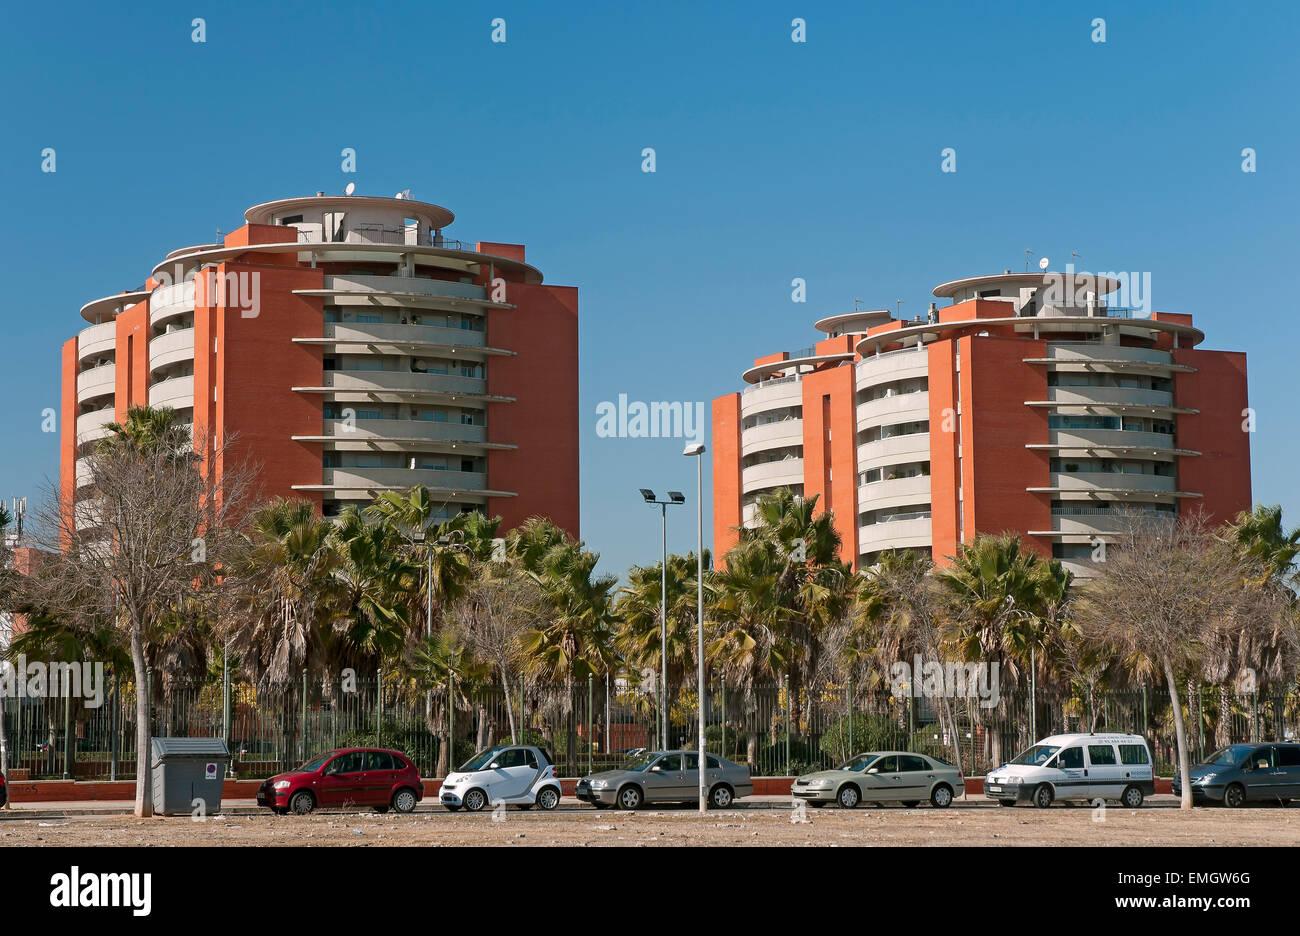 Urbanisierung stockfotos urbanisierung bilder alamy - Jardines de hercules sevilla ...